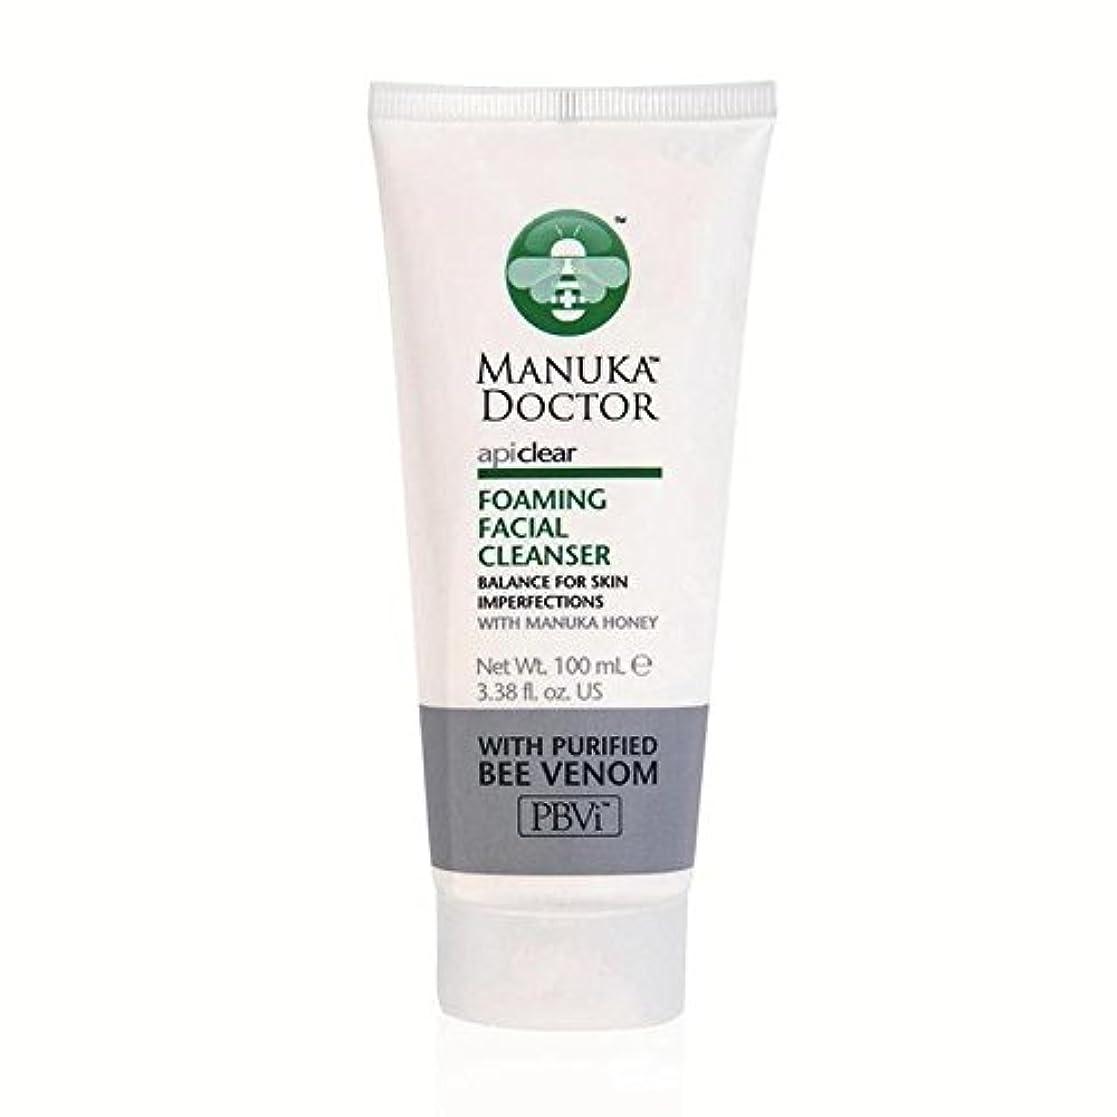 Manuka Doctor Api Clear Foaming Facial Cleanser 100ml - マヌカドクター明確な泡立ち洗顔料の100ミリリットル [並行輸入品]